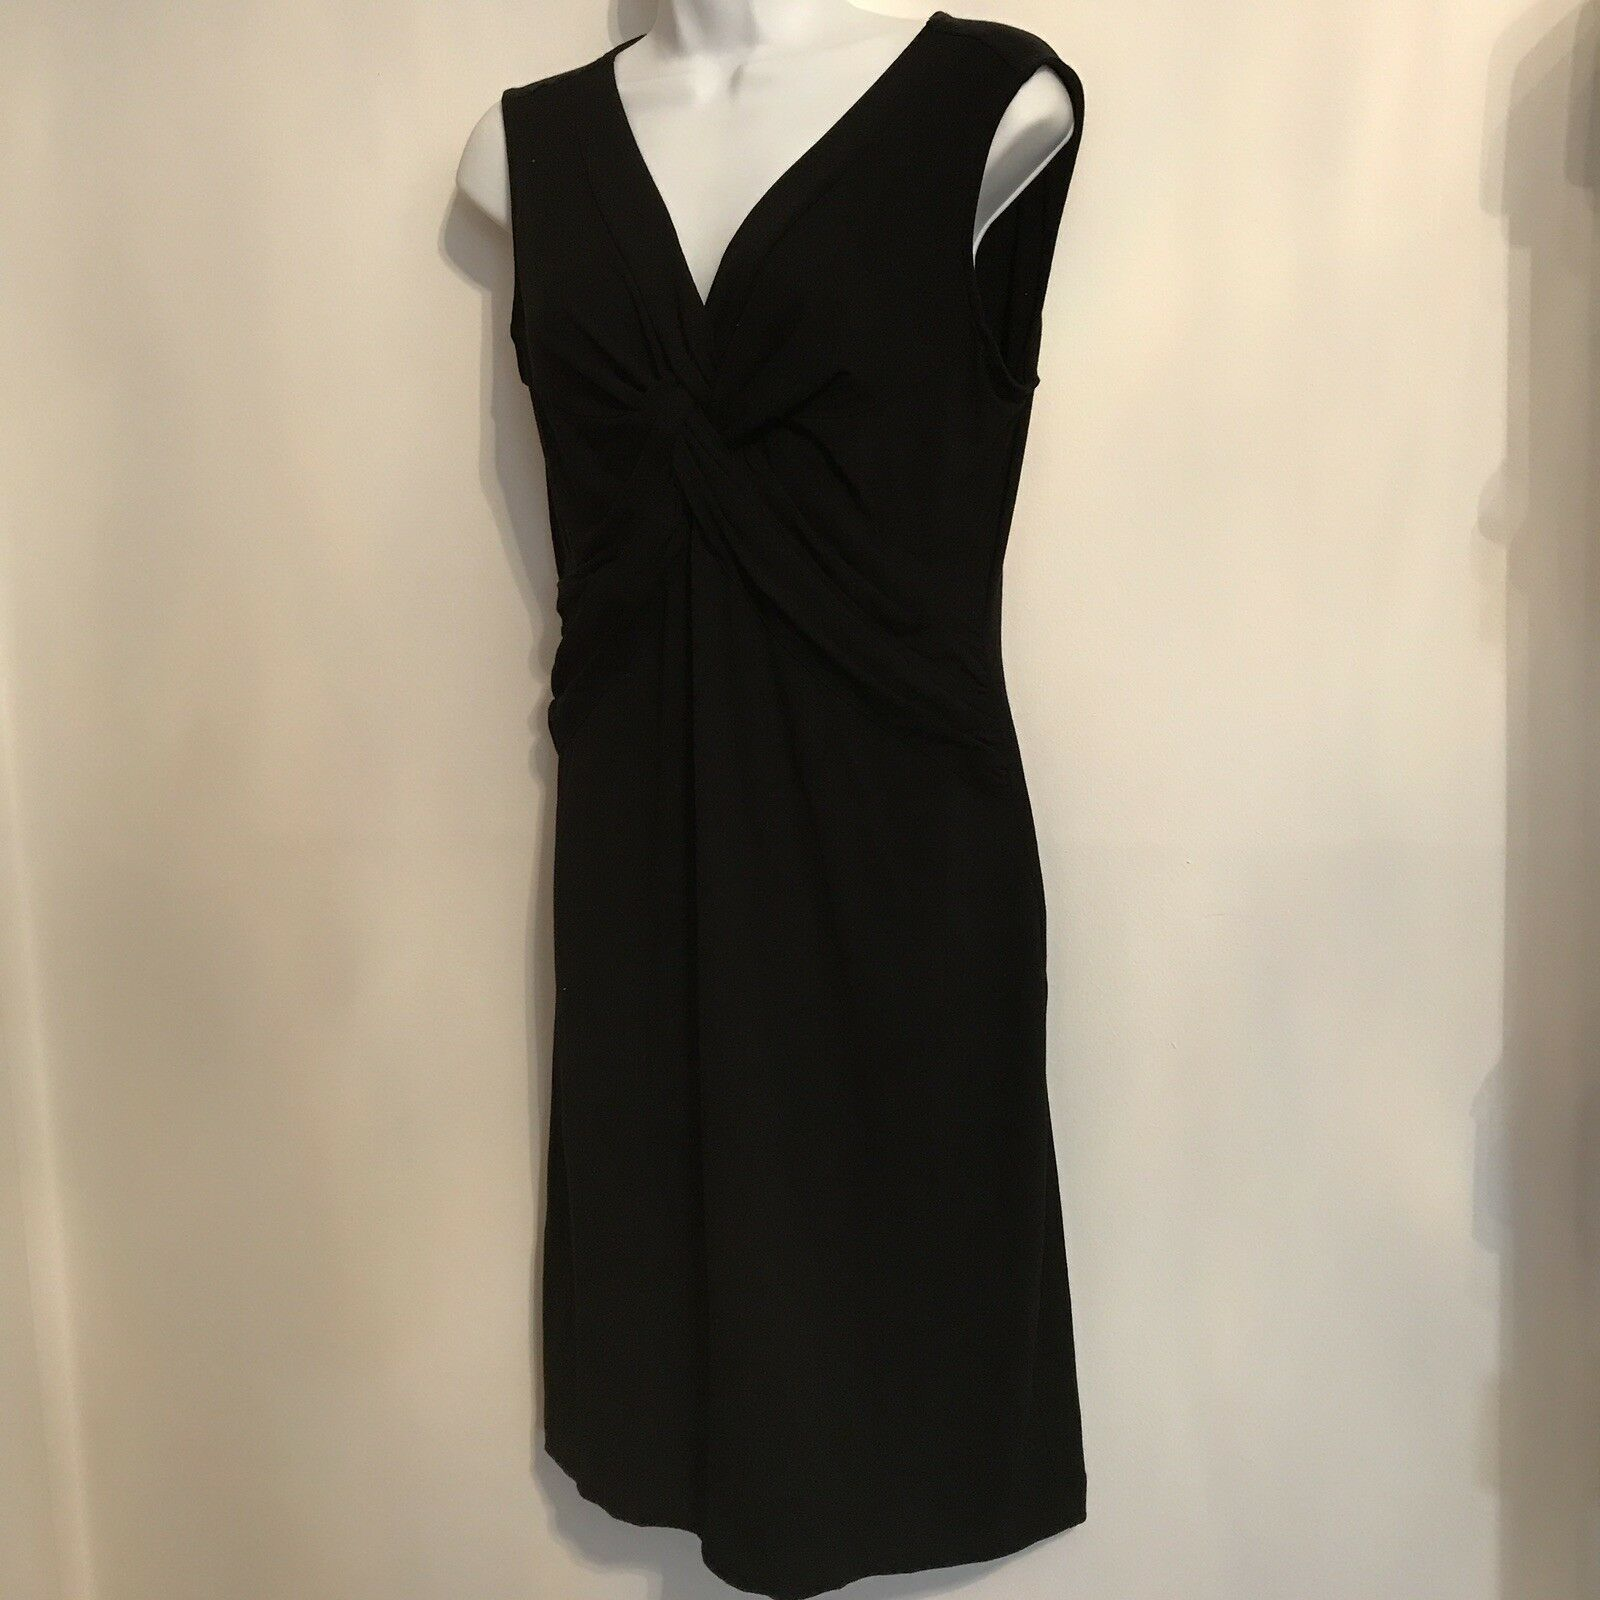 Nwt Ann Taylor schwarz Knot Dress. Größe Medium